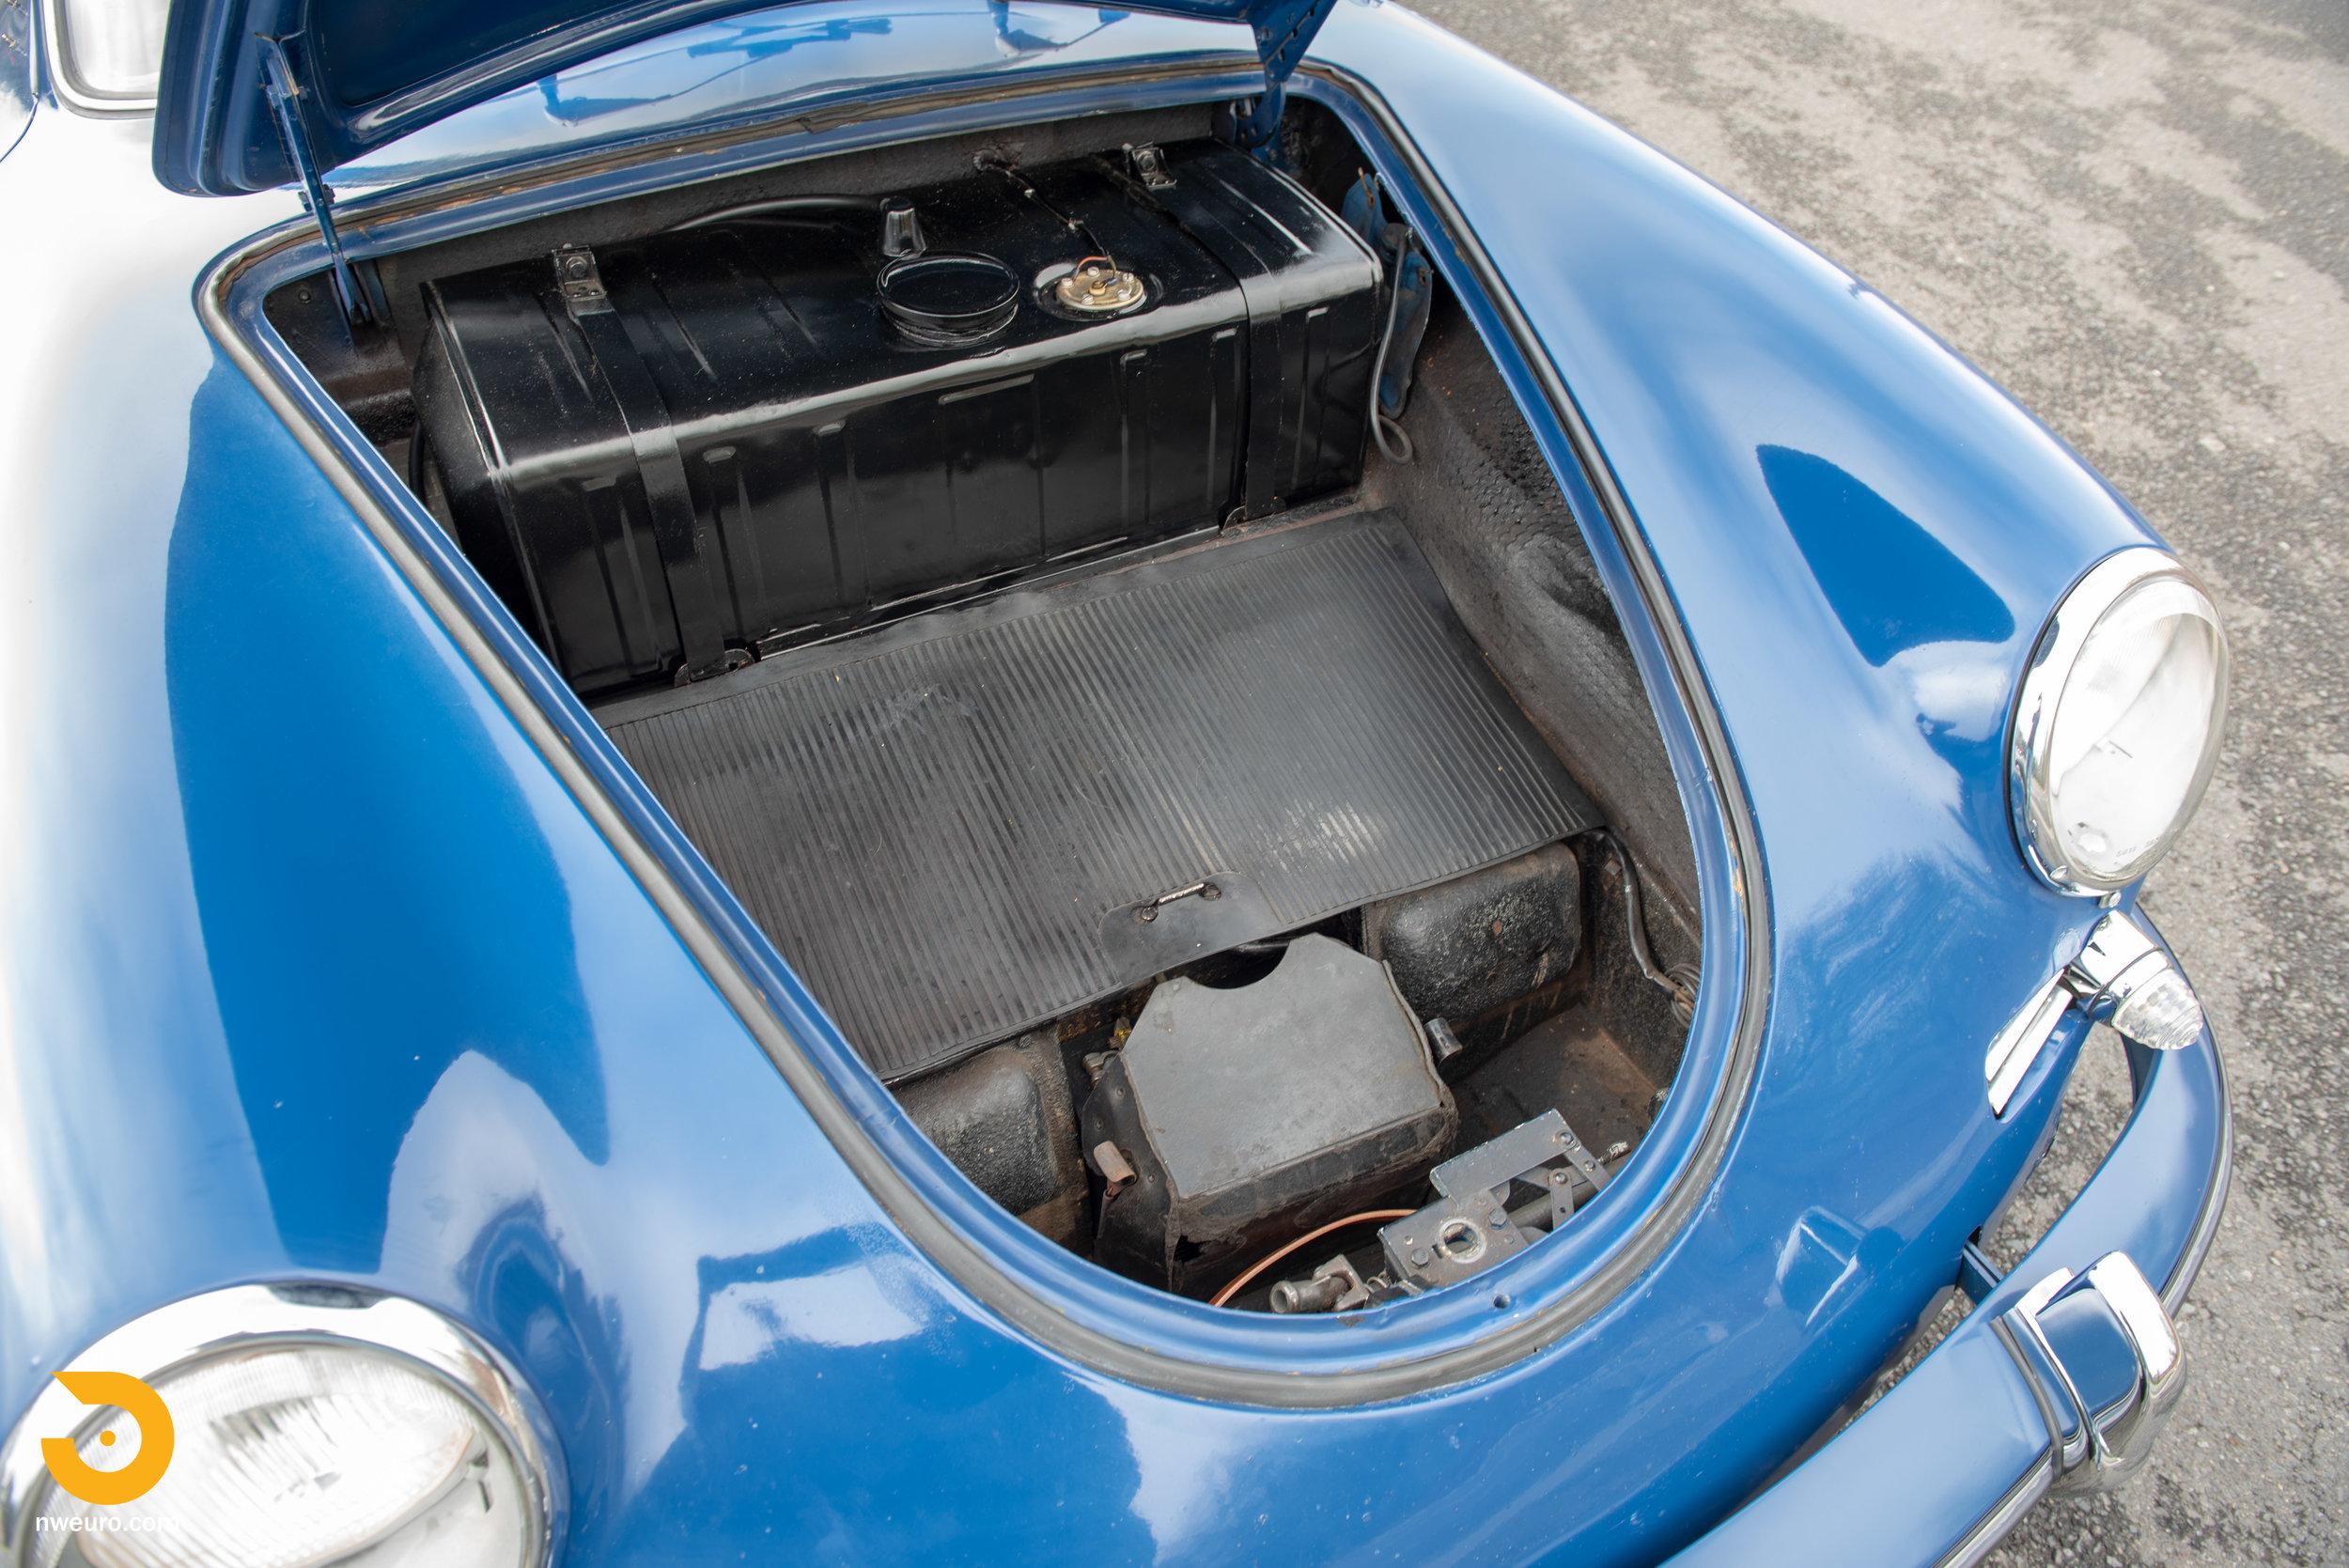 1960 Porsche 356 Hardtop Cab 1600 Super-65.jpg